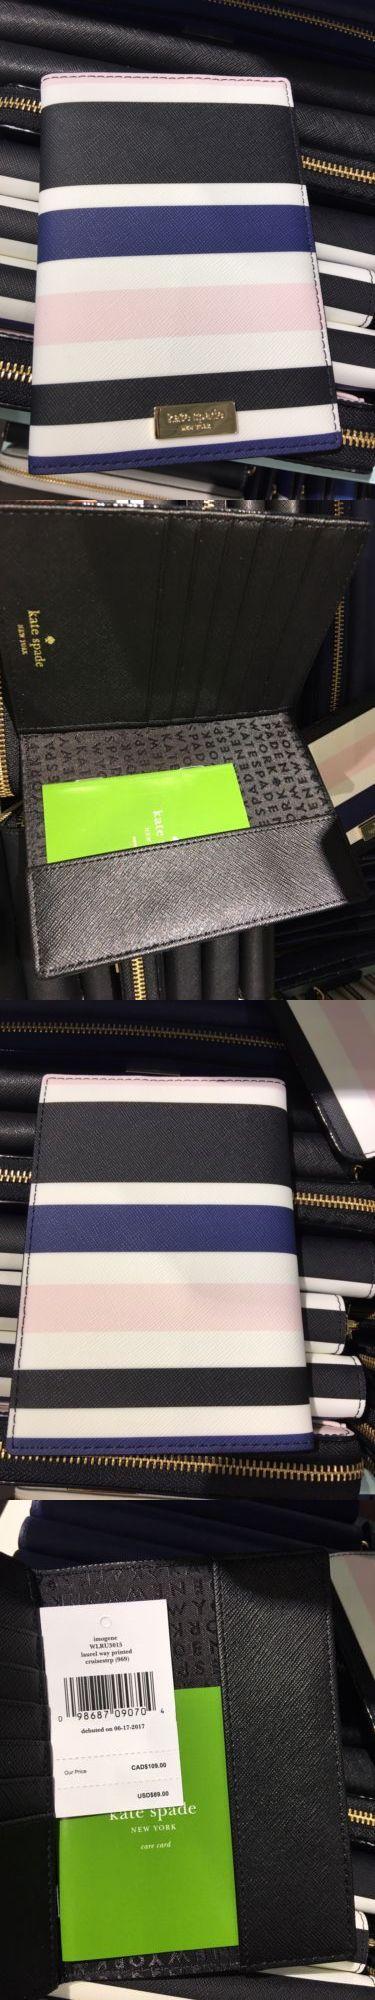 Passport Holders 169288: Nwt Kaye Spade Imogene Laurel Way Cruisestrp Printed Passport Holder Wallet $89 -> BUY IT NOW ONLY: $45 on eBay!